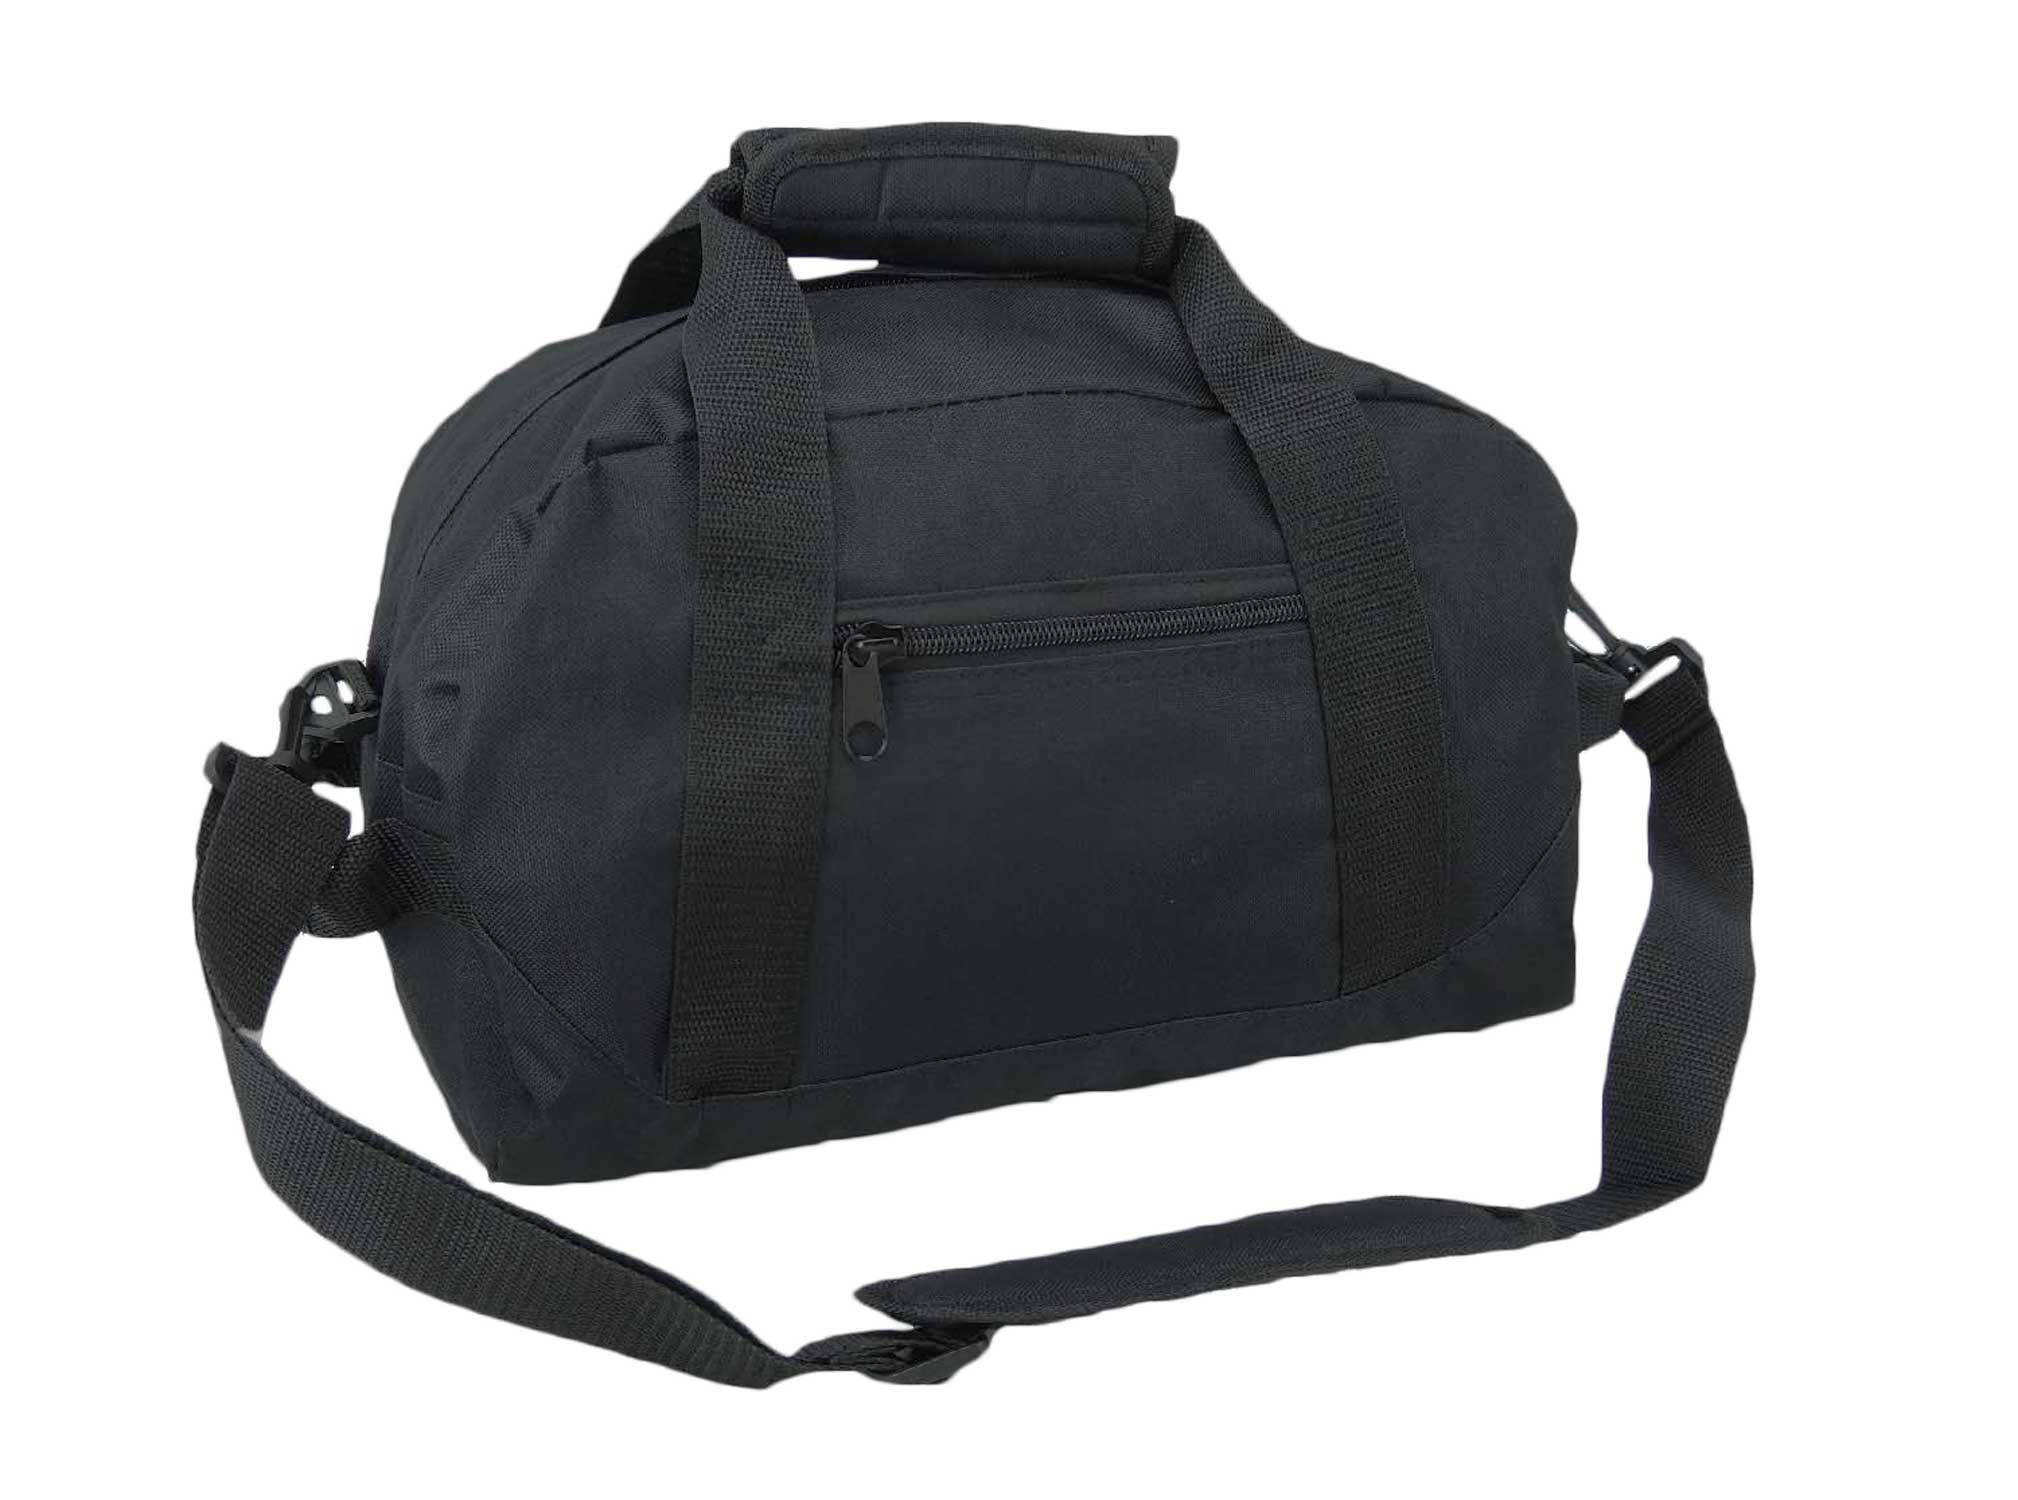 DALIX 14'' Small Duffle Bag Two Toned Gym Travel Bag (Black)